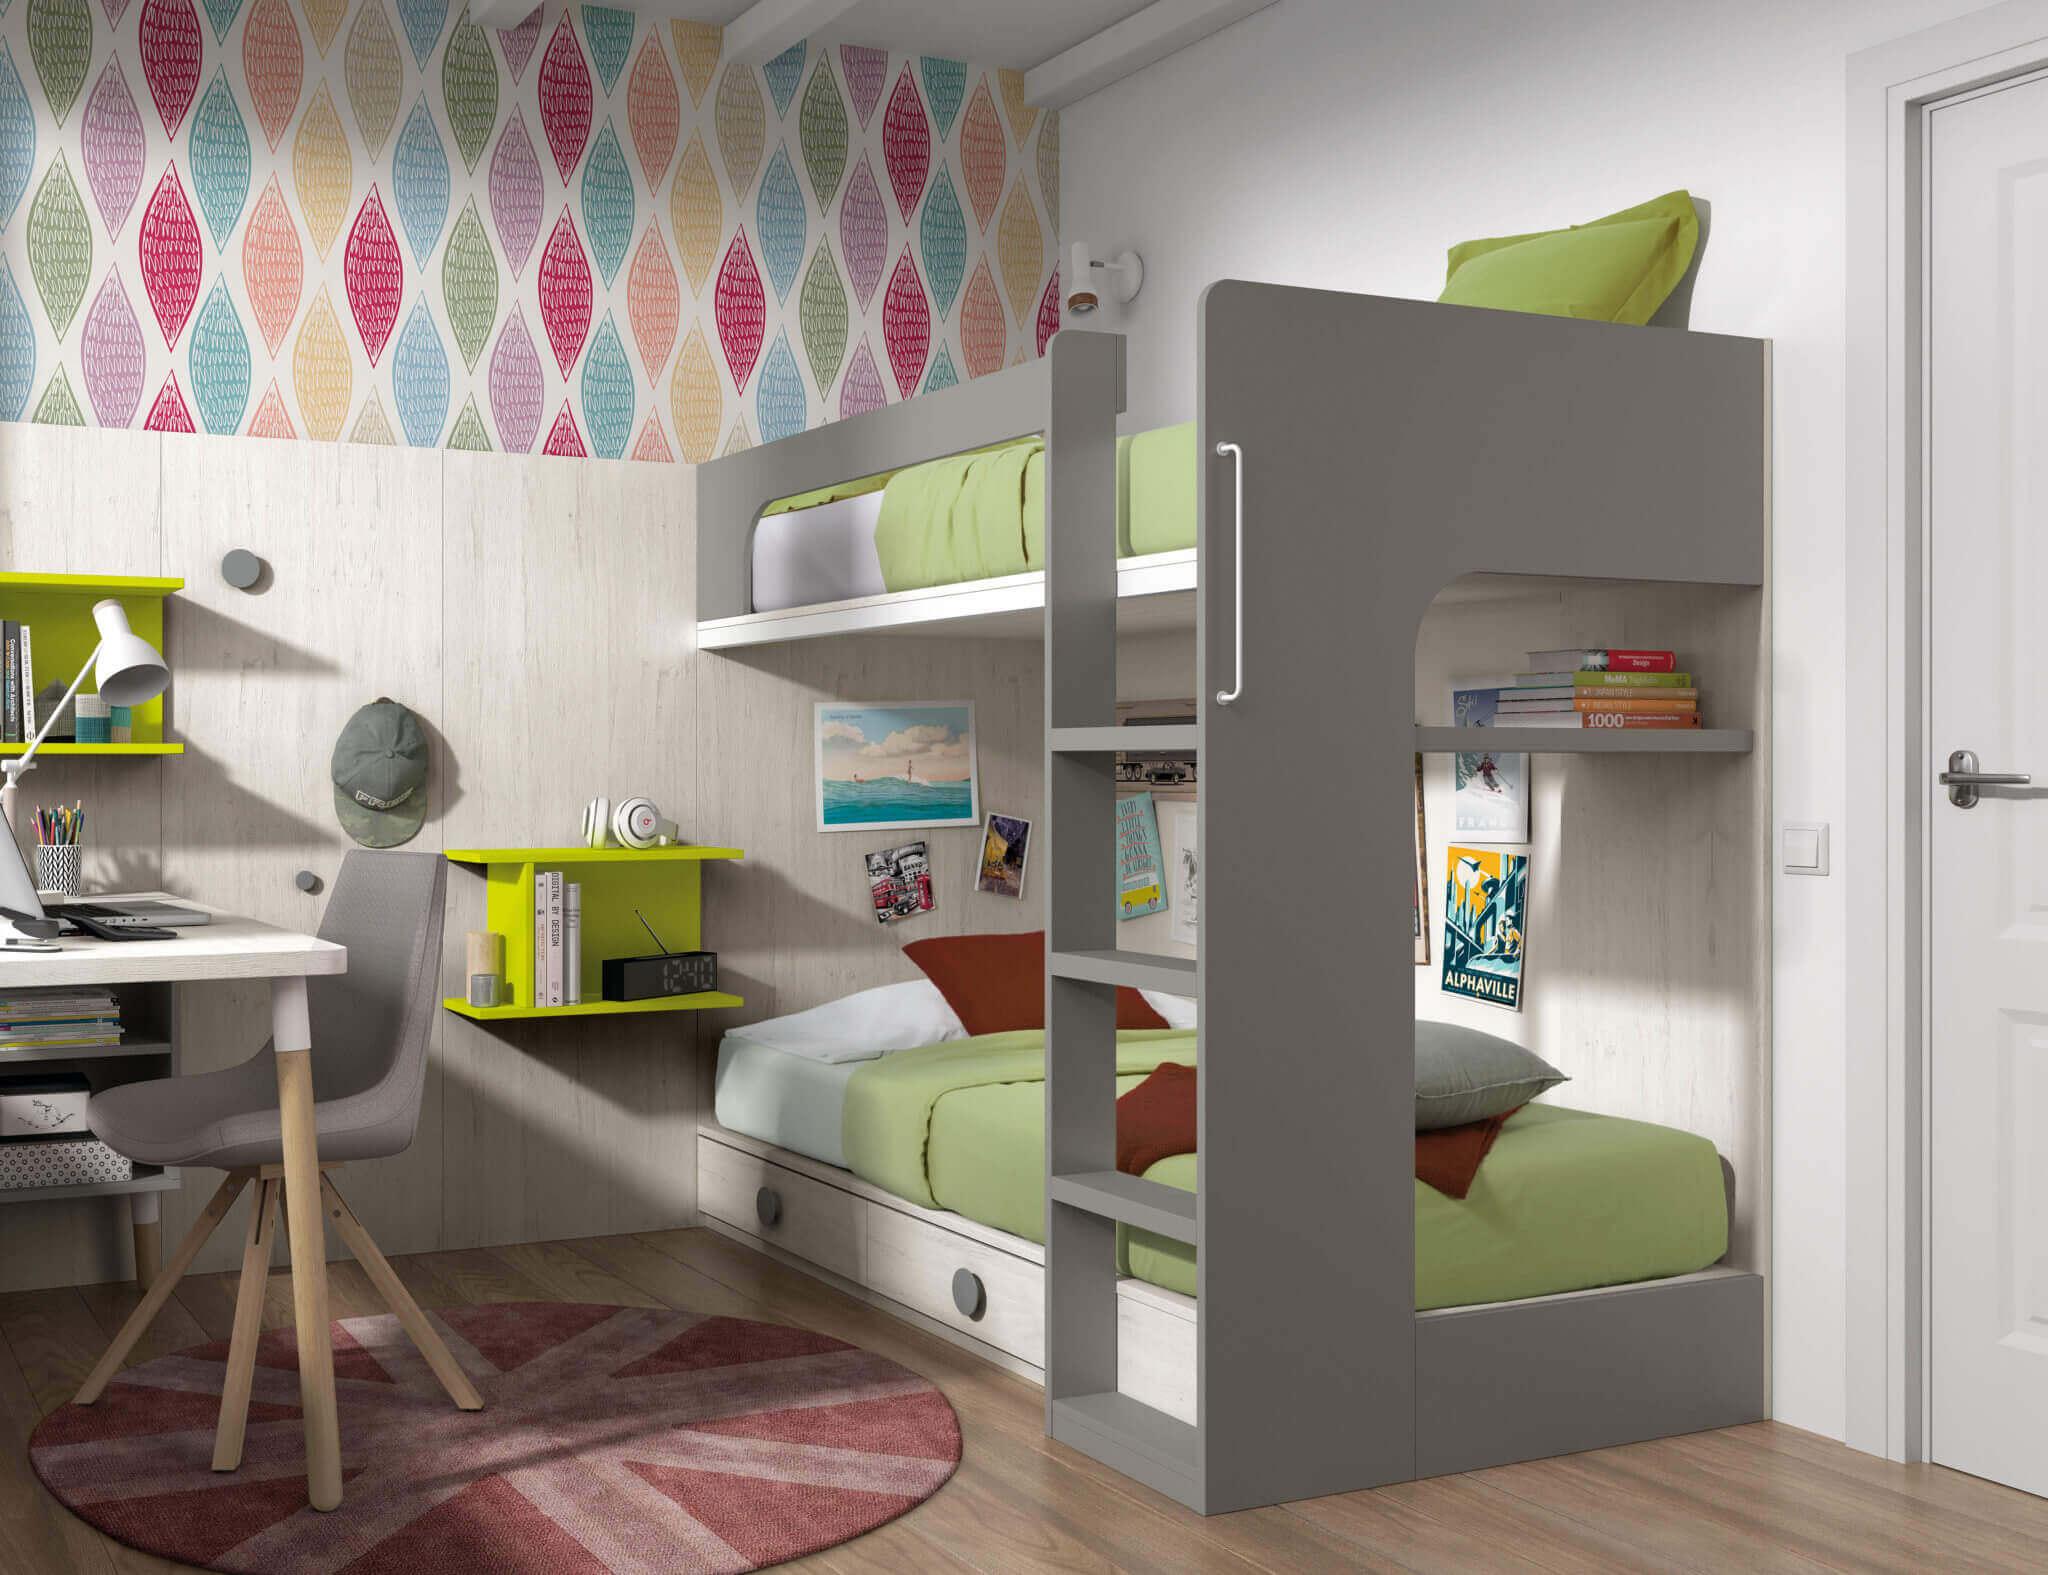 Muebles juveniles literas literas juveniles dormitorios juveniles - Muebles shena literas ...